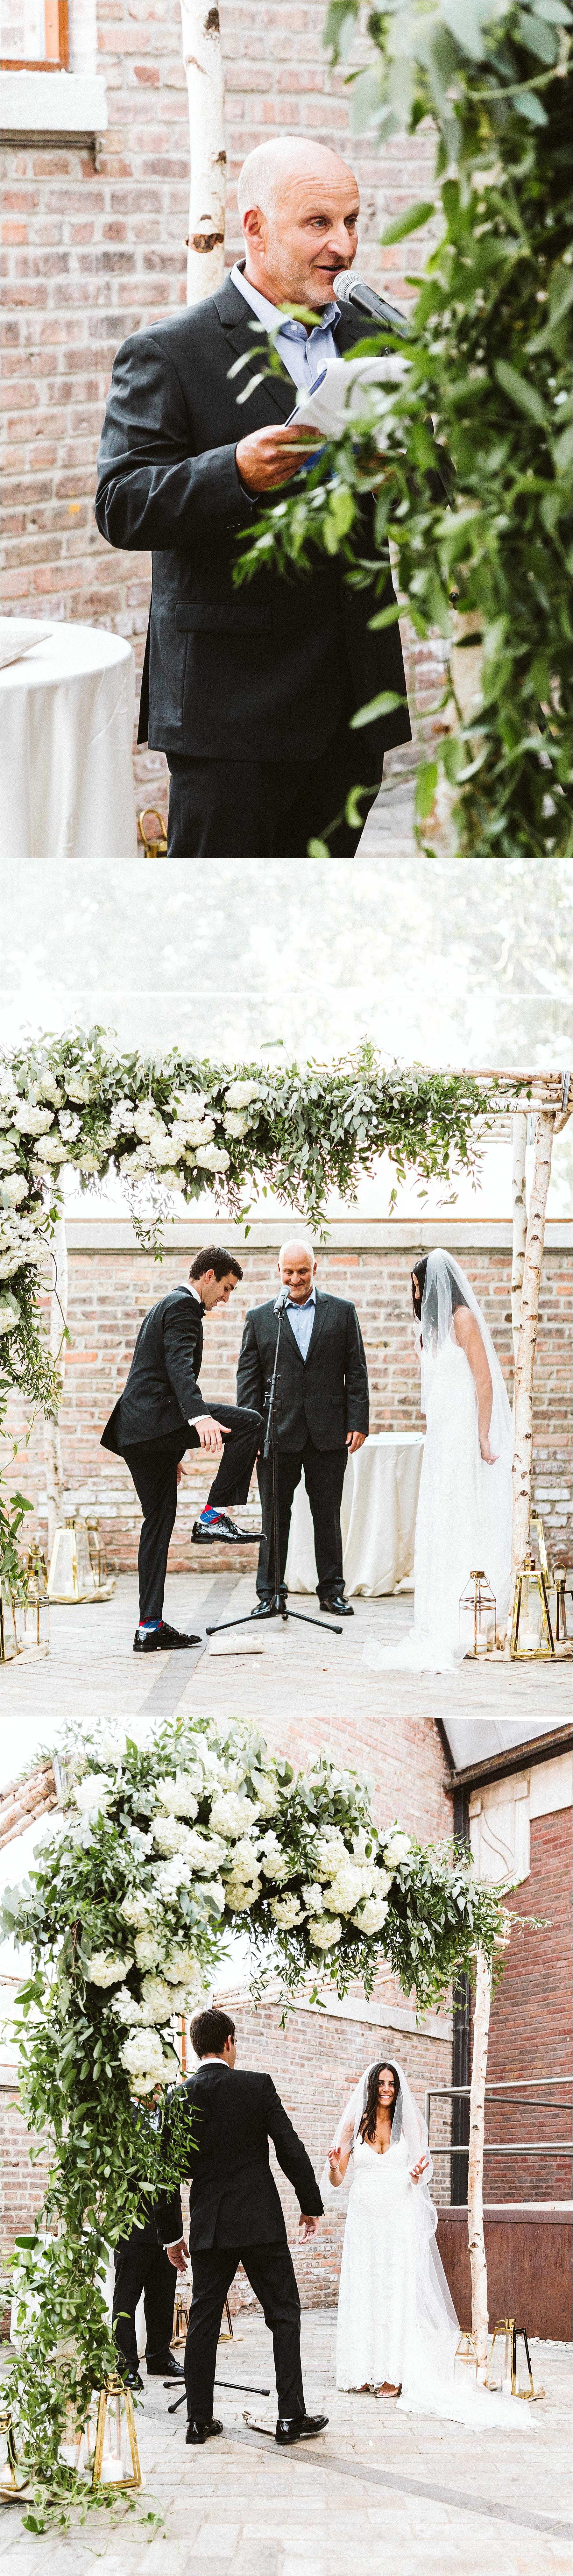 Bridgeport Art Center Wedding_0103.jpg